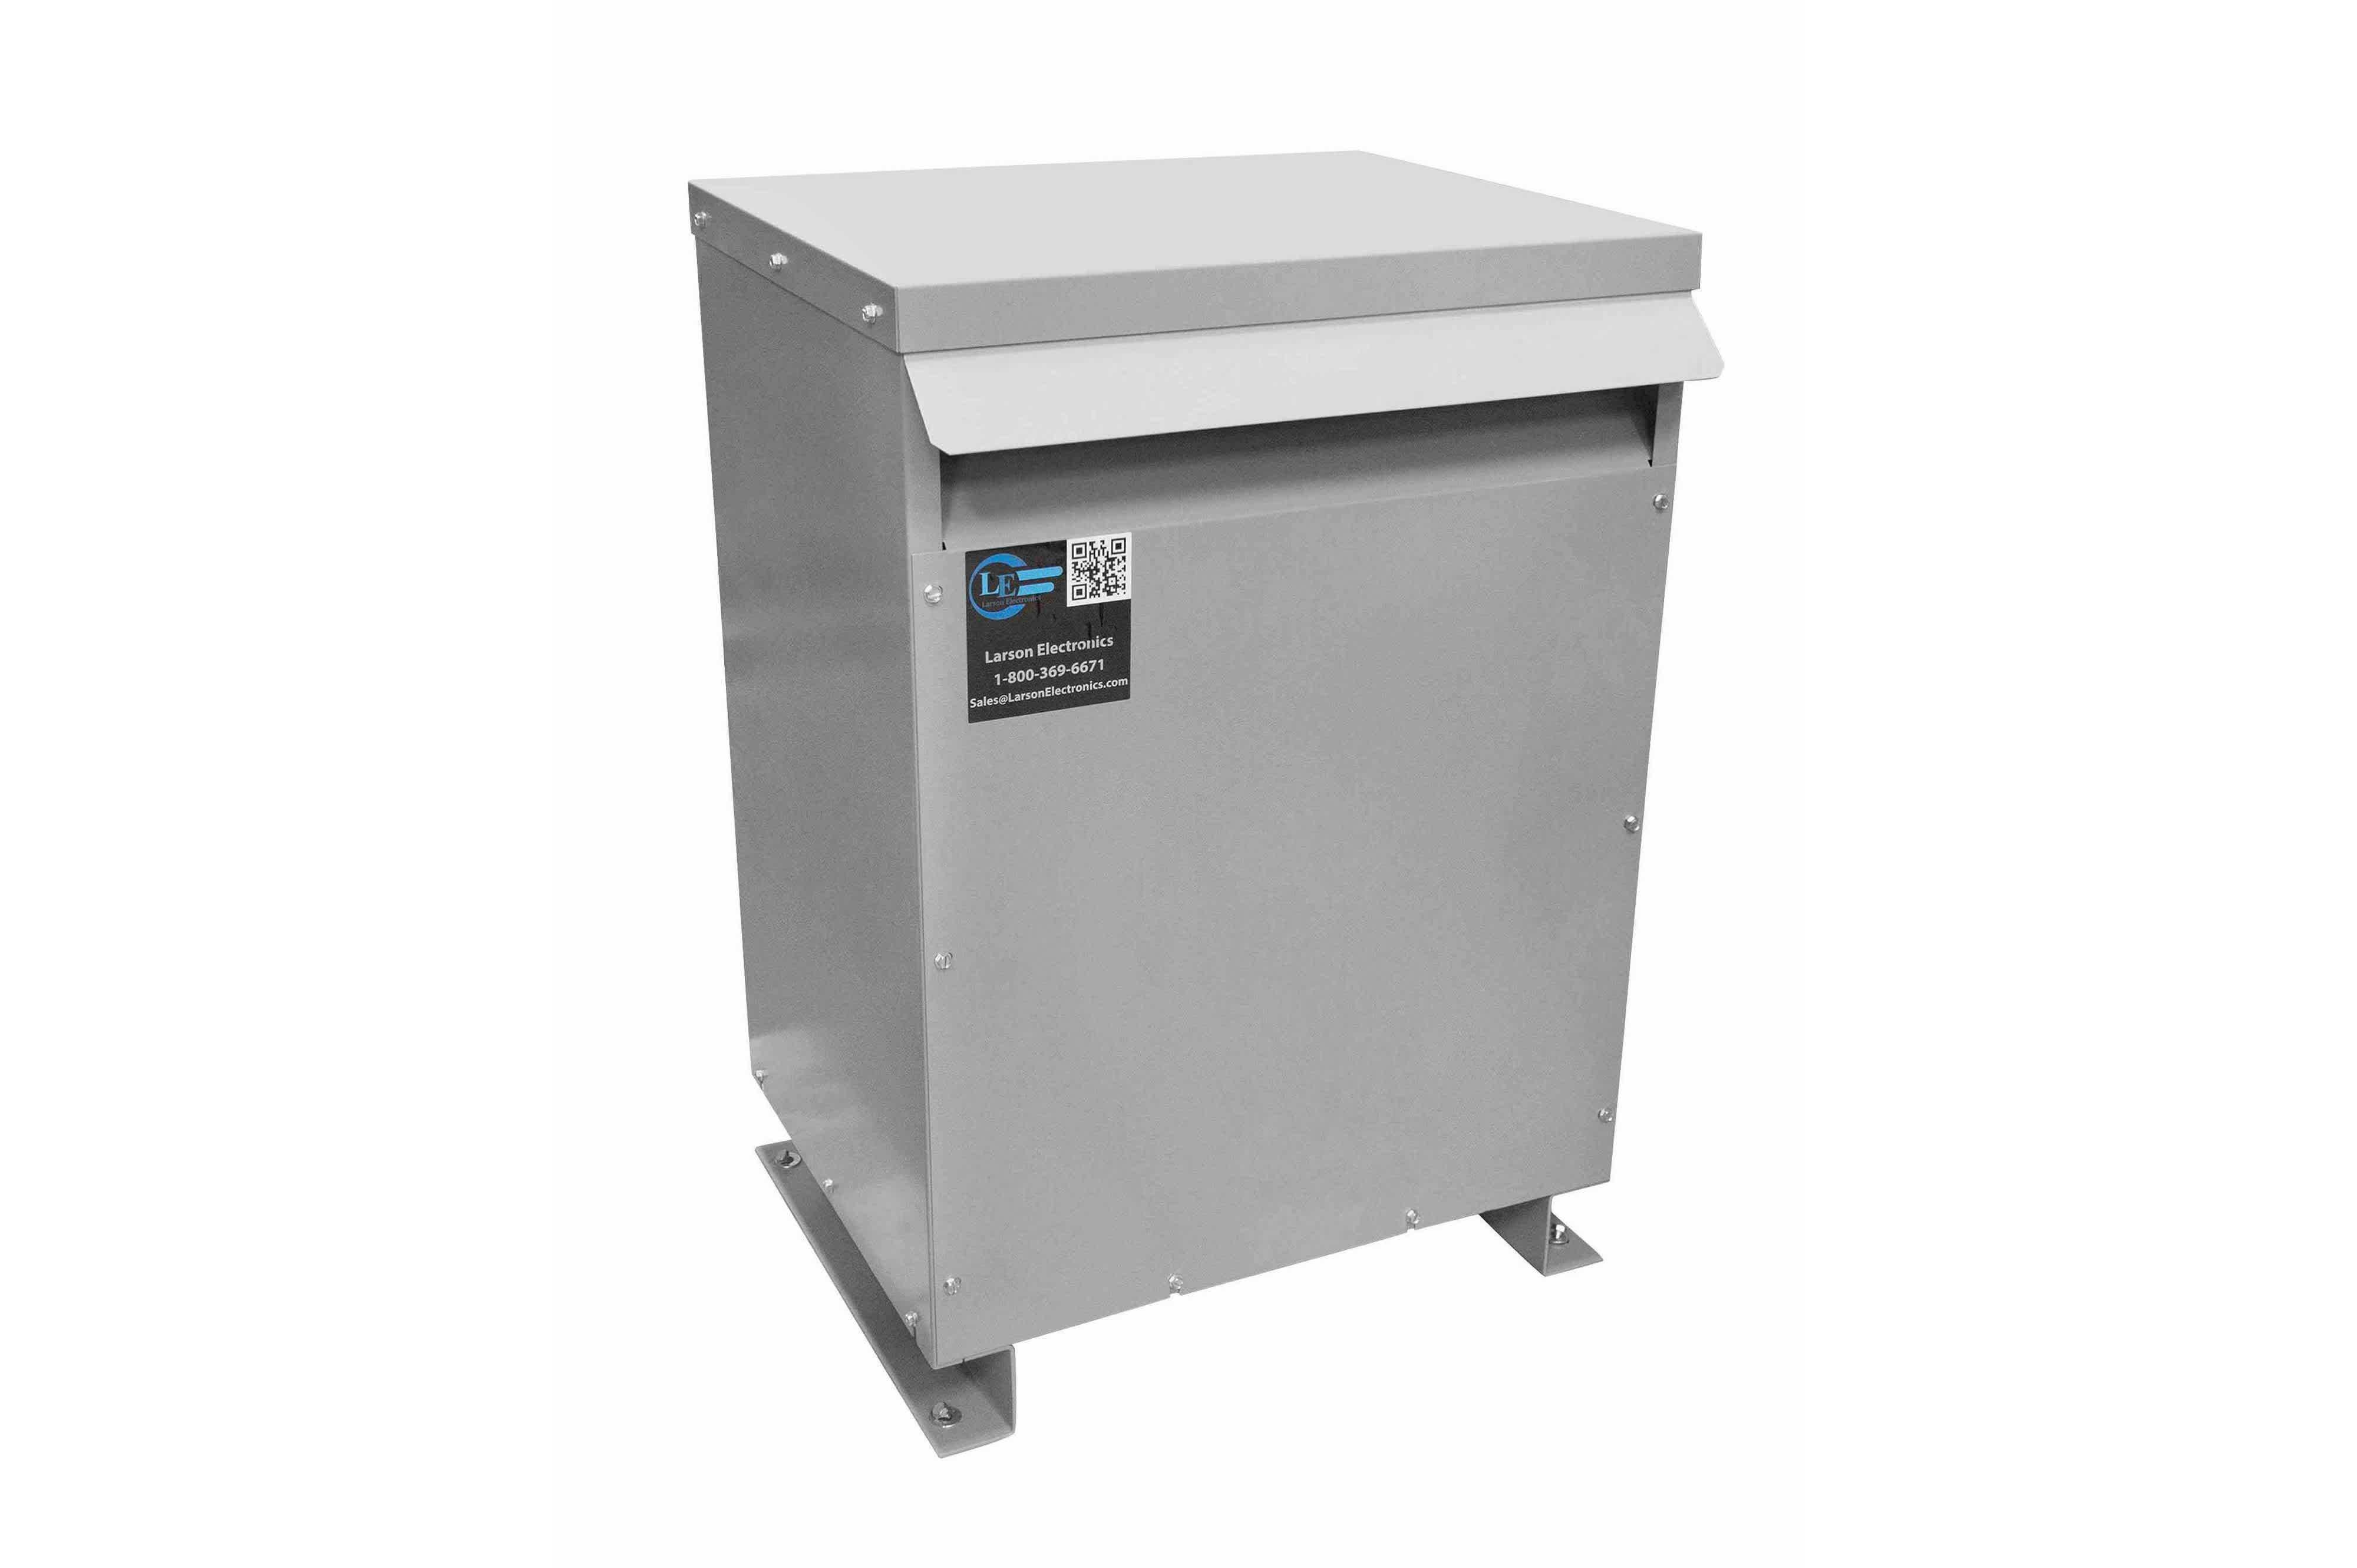 400 kVA 3PH Isolation Transformer, 415V Wye Primary, 480V Delta Secondary, N3R, Ventilated, 60 Hz